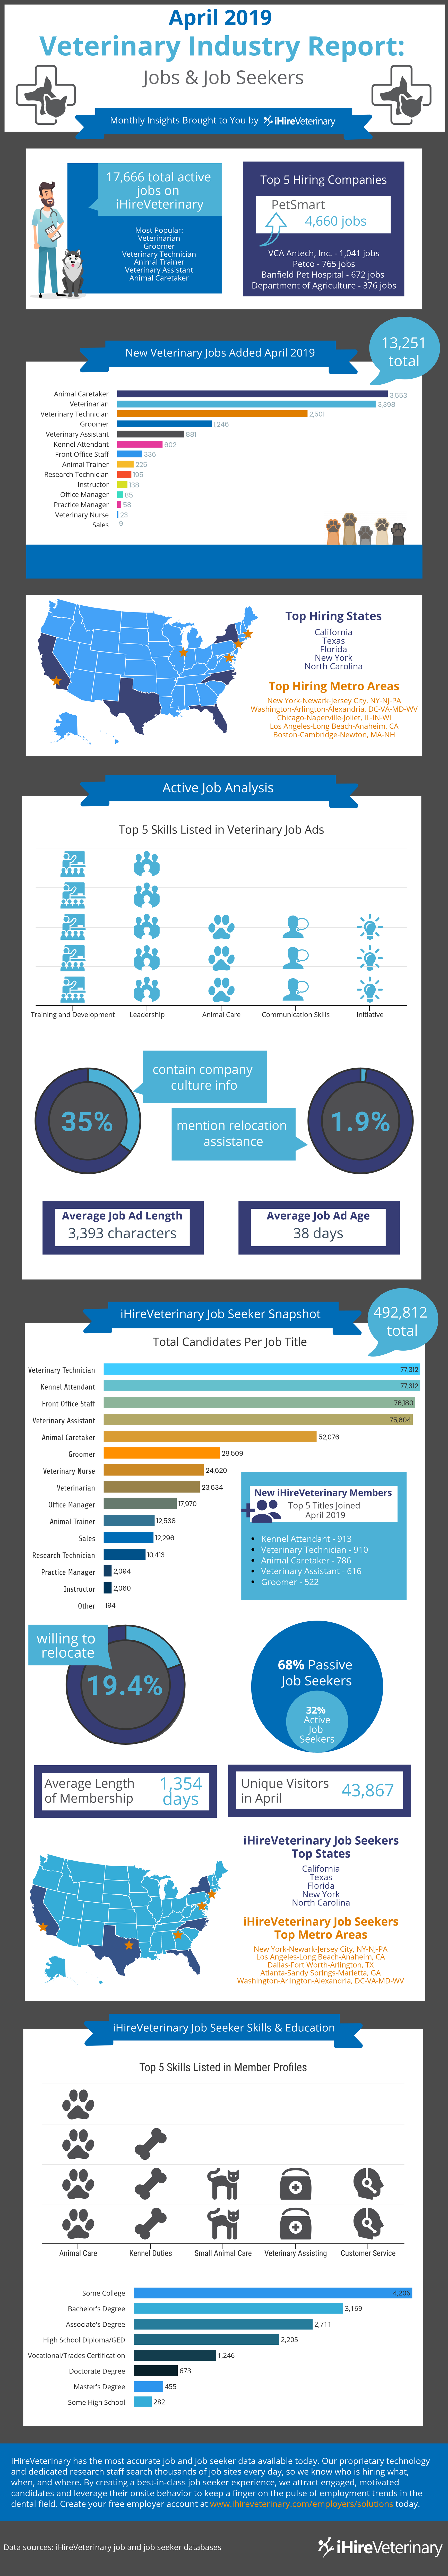 ihireveterinary april 2019 veterinary industry infographic